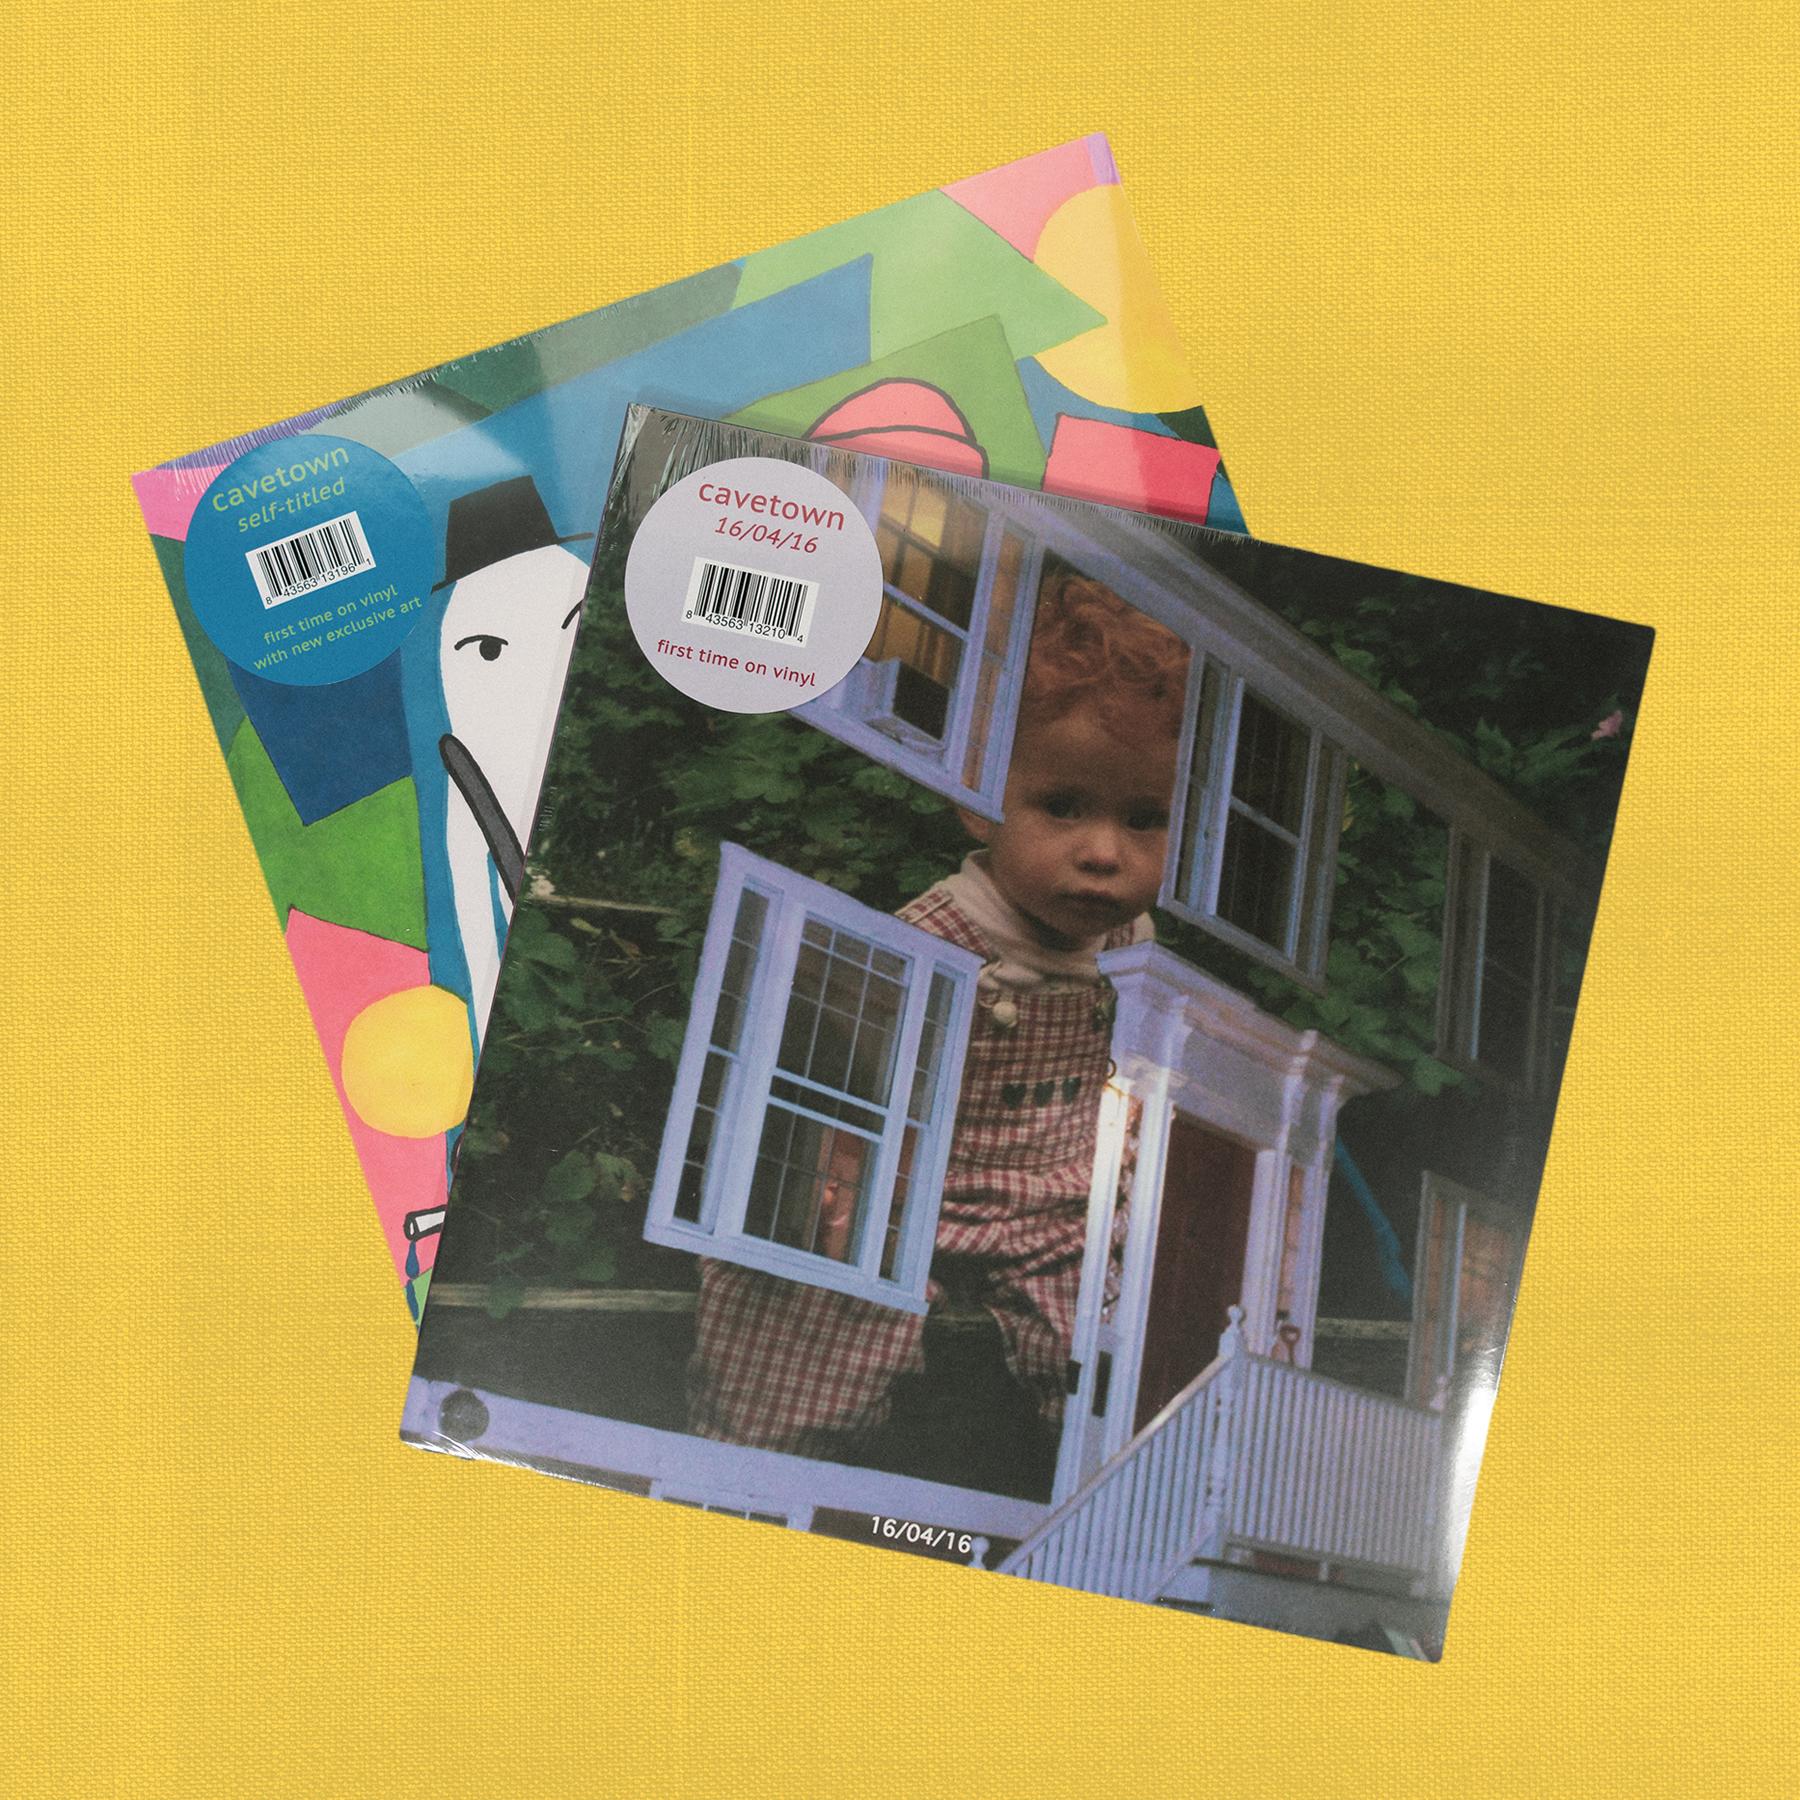 Self Titled + 16/04/16 Vinyl Bundle